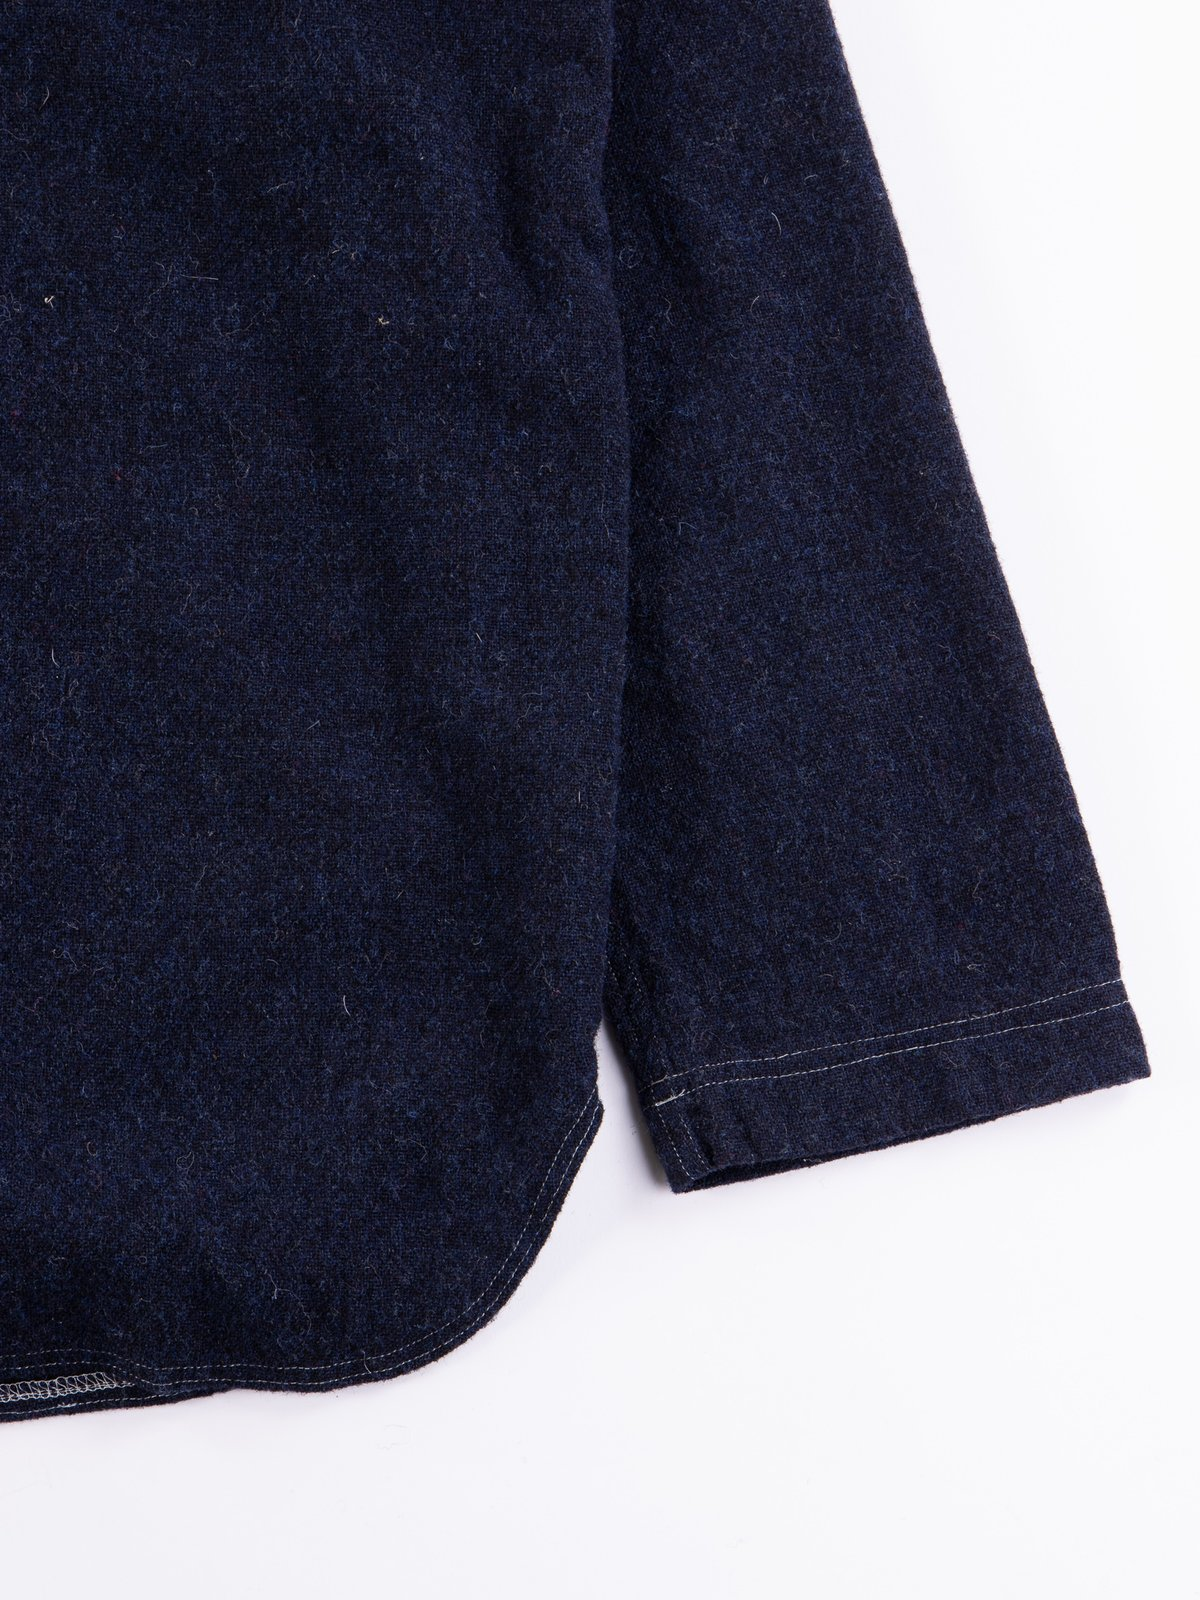 Navy Weavers Stock Tail Shirt - Image 4